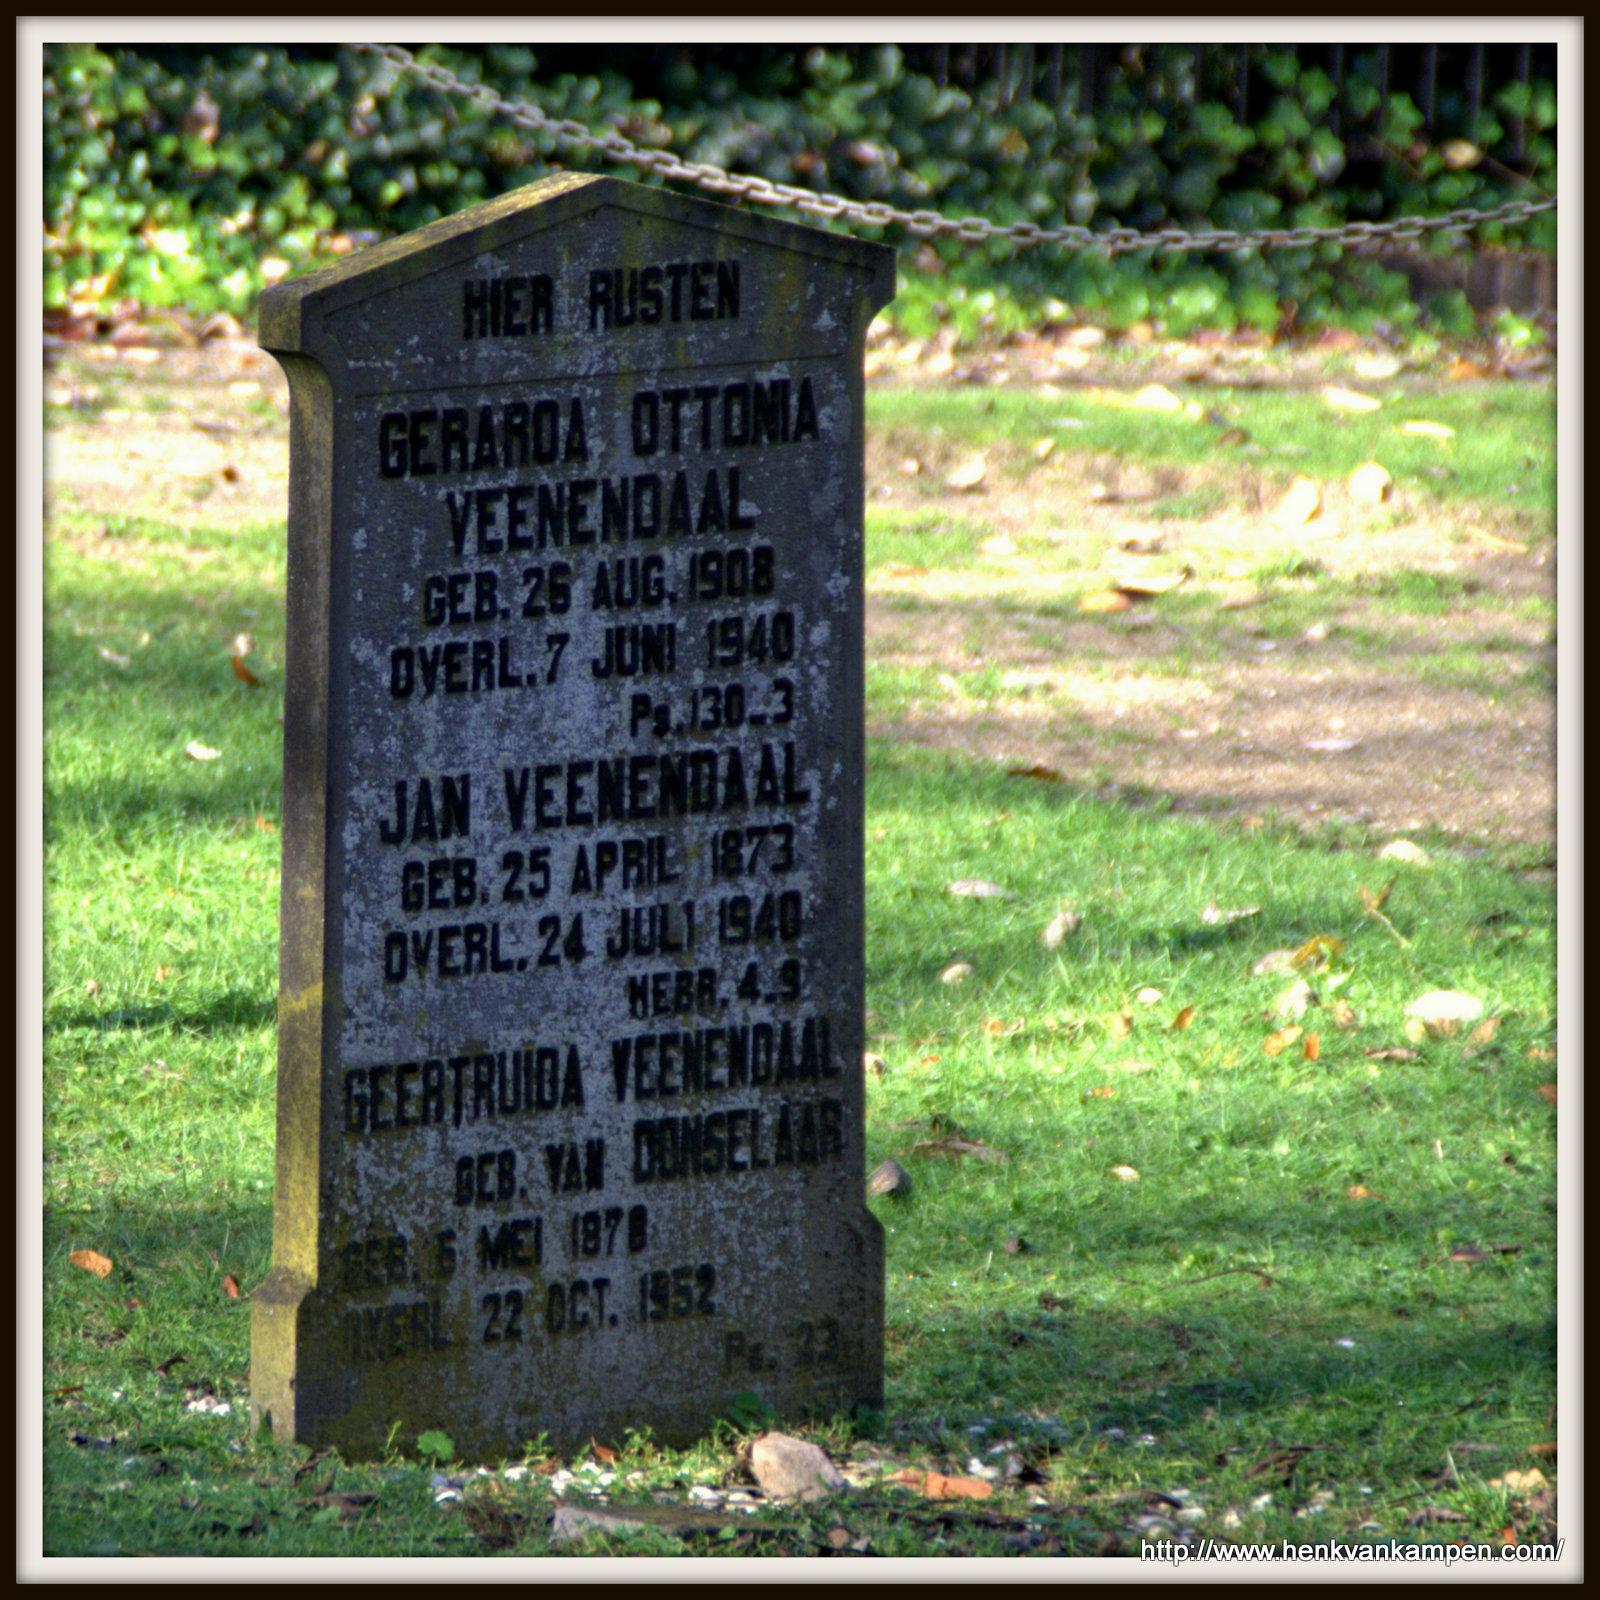 Veenendaal family grave, cemetery of Oud Leusden